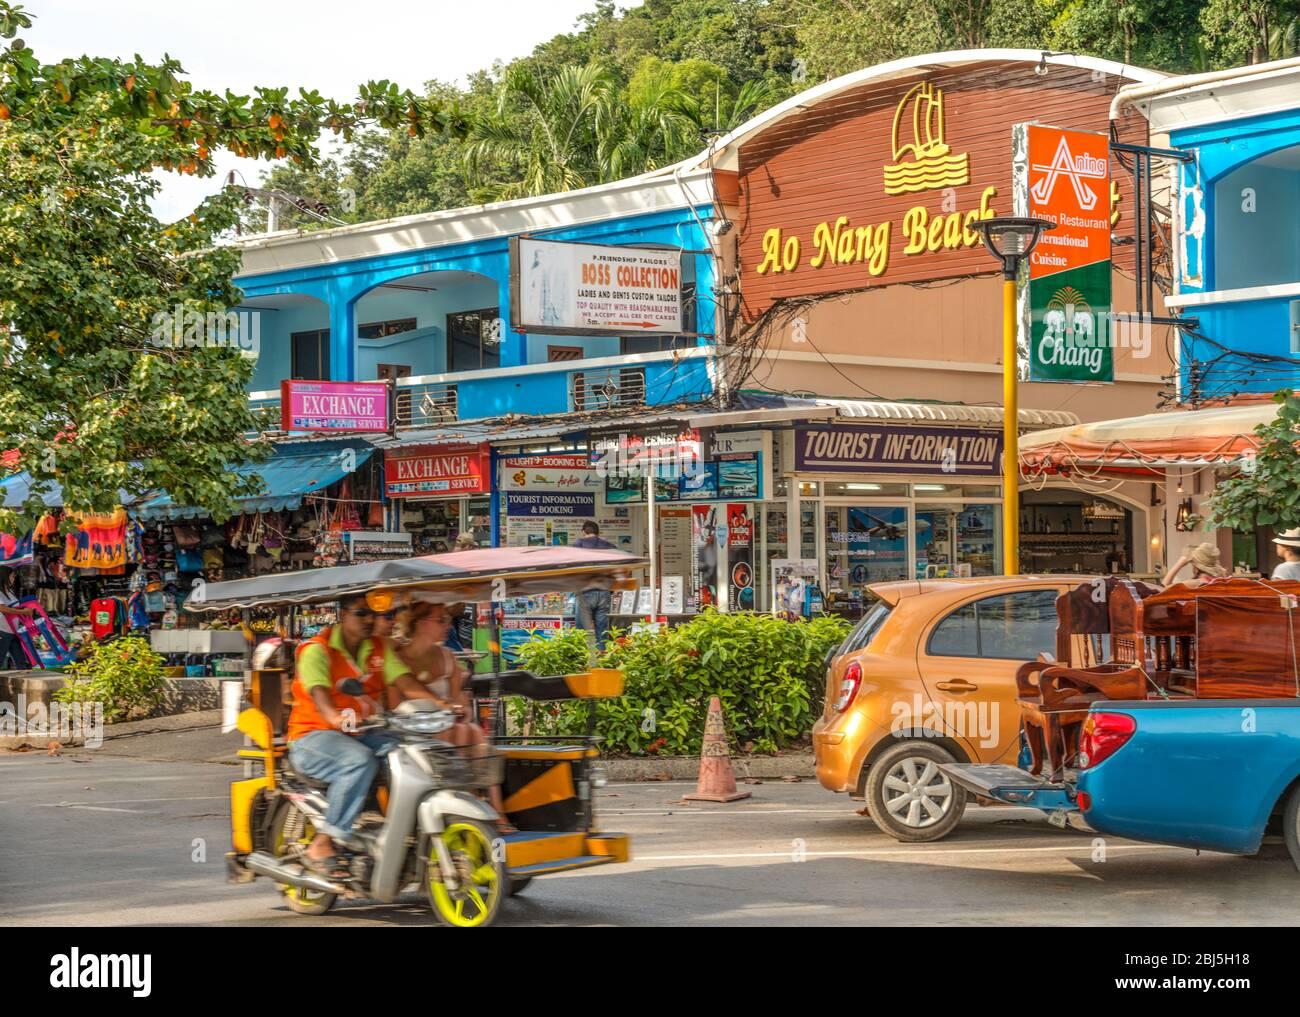 Calle comercial en el desfile de playa de Ao Nang Beach, Krabi, Tailandia Foto de stock